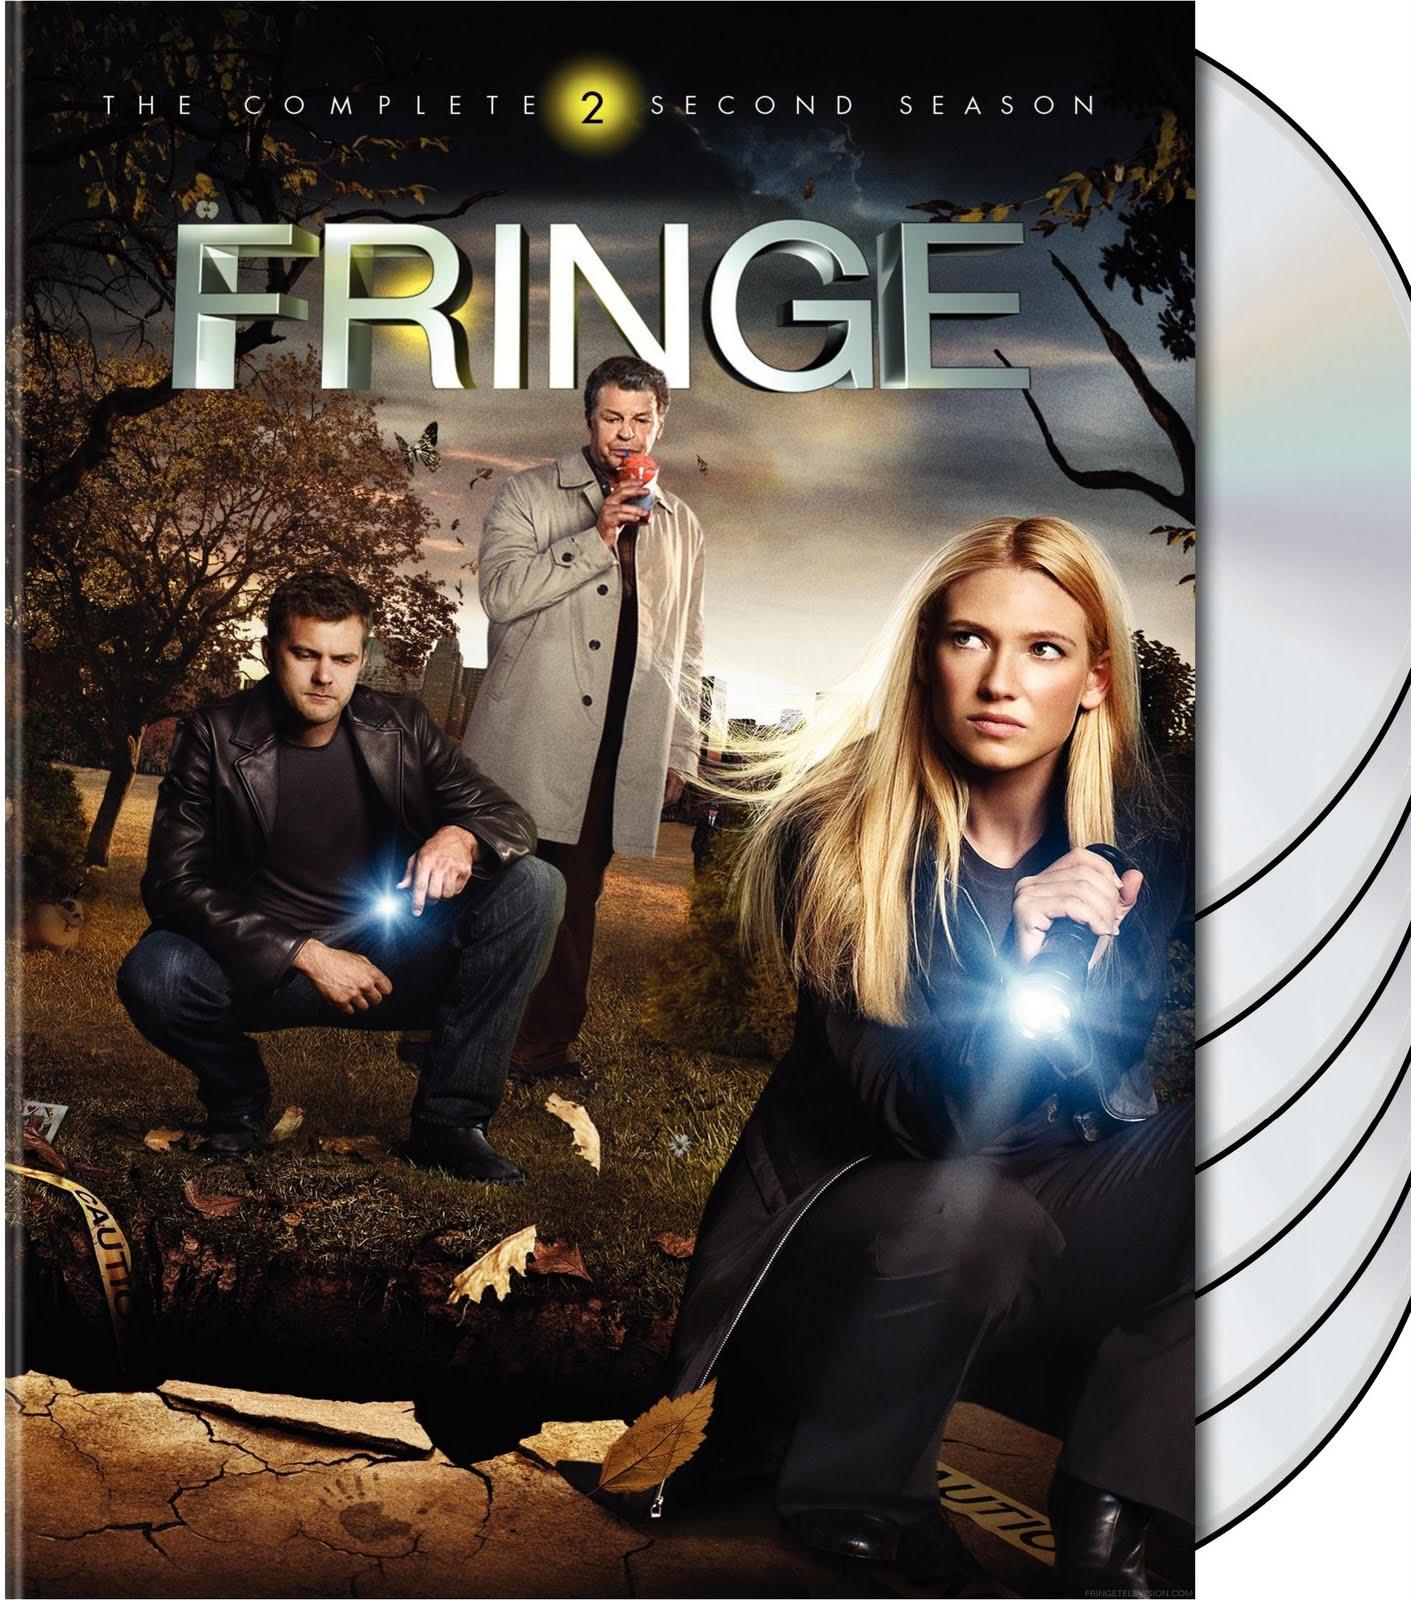 fox fringe episodes season 3Preorder Fringe Season 2 on Blu ray or DVD   Fringe Television iVOaGL8v